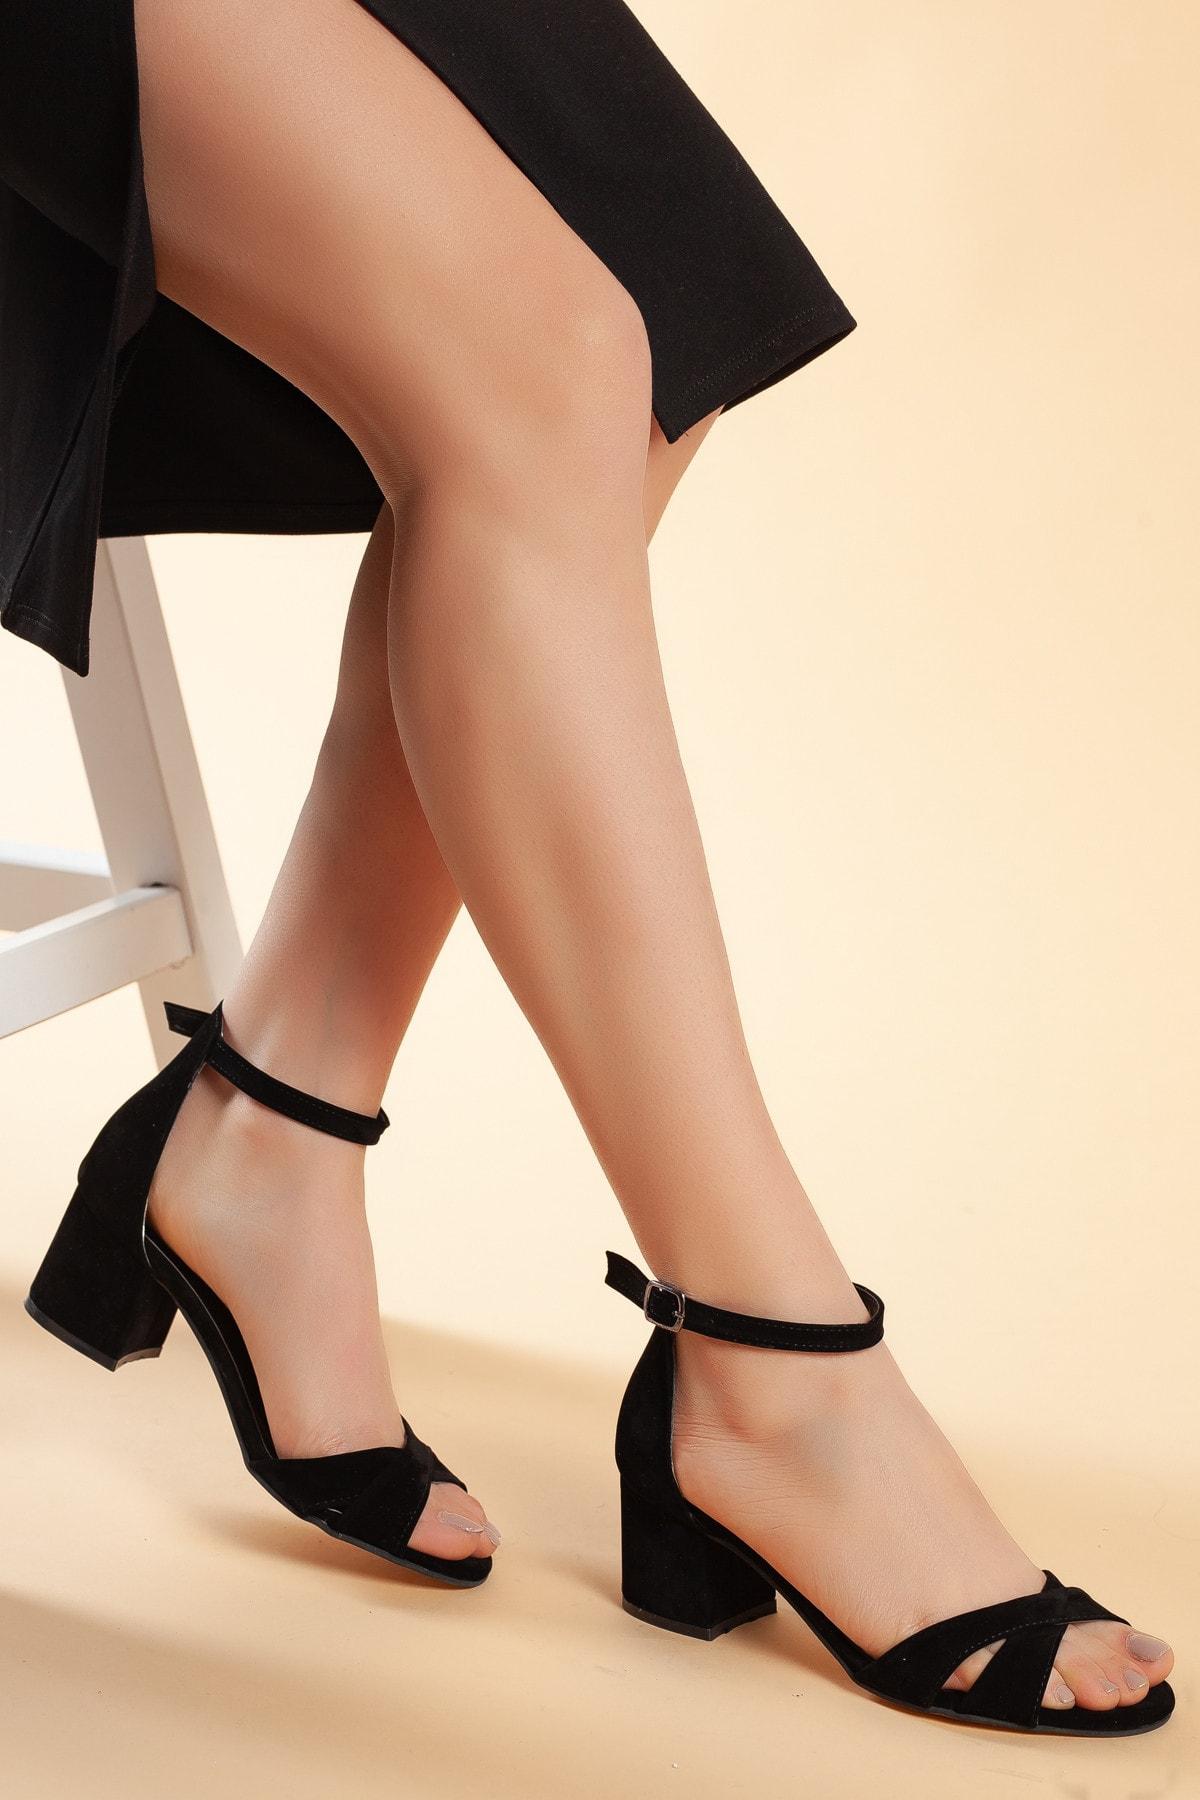 Daxtors Siyah-Süet Kadın Ayakkabı DXTRFLRN204